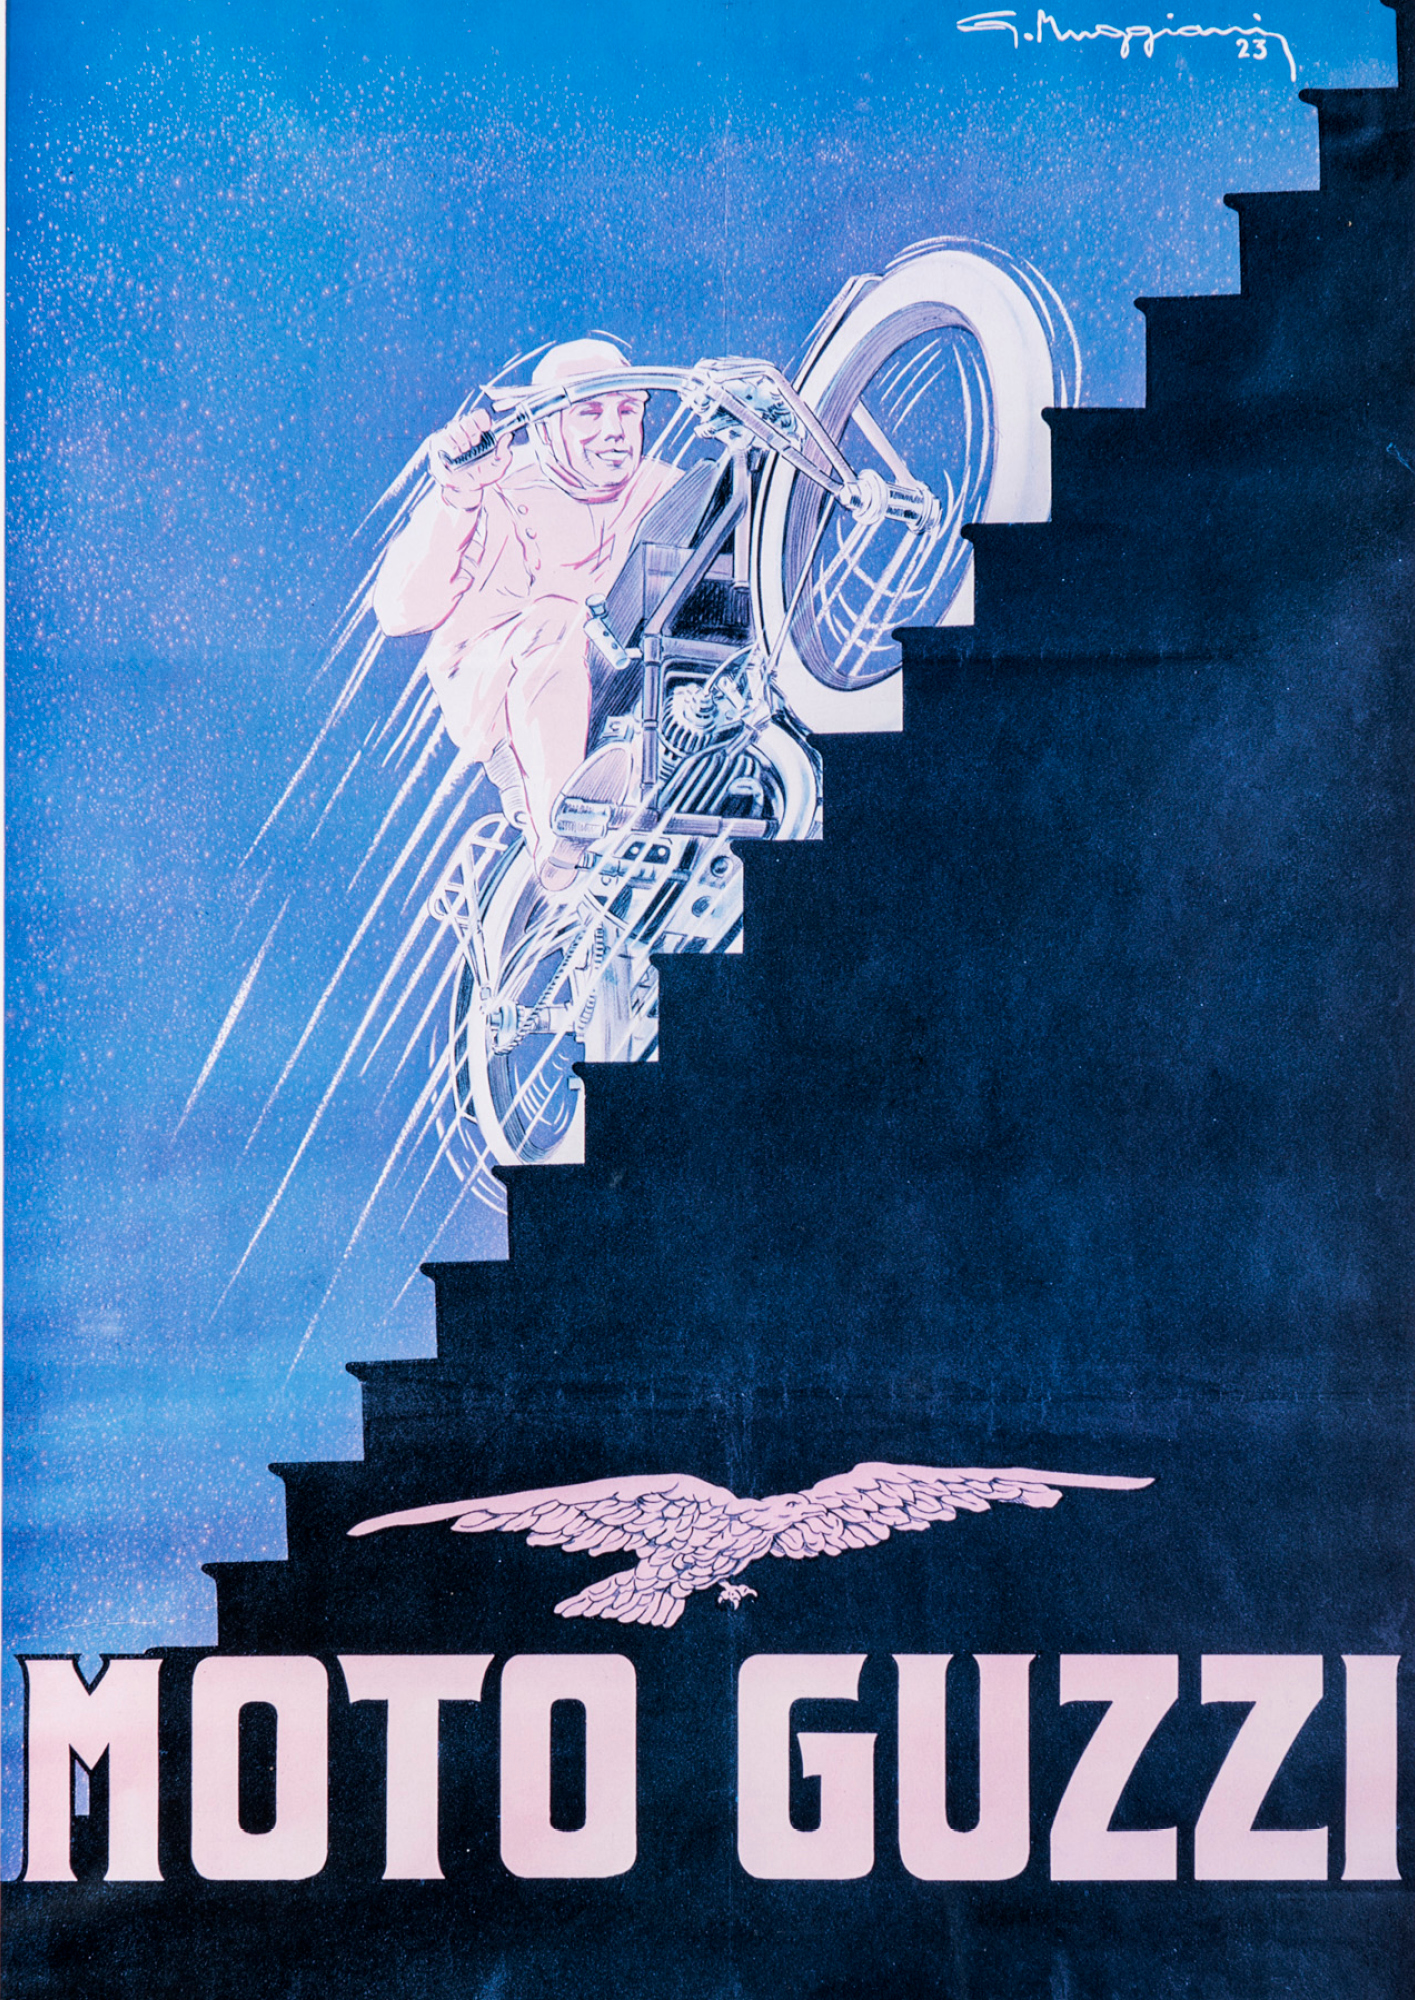 An advert for Moto Guzzi from 1923